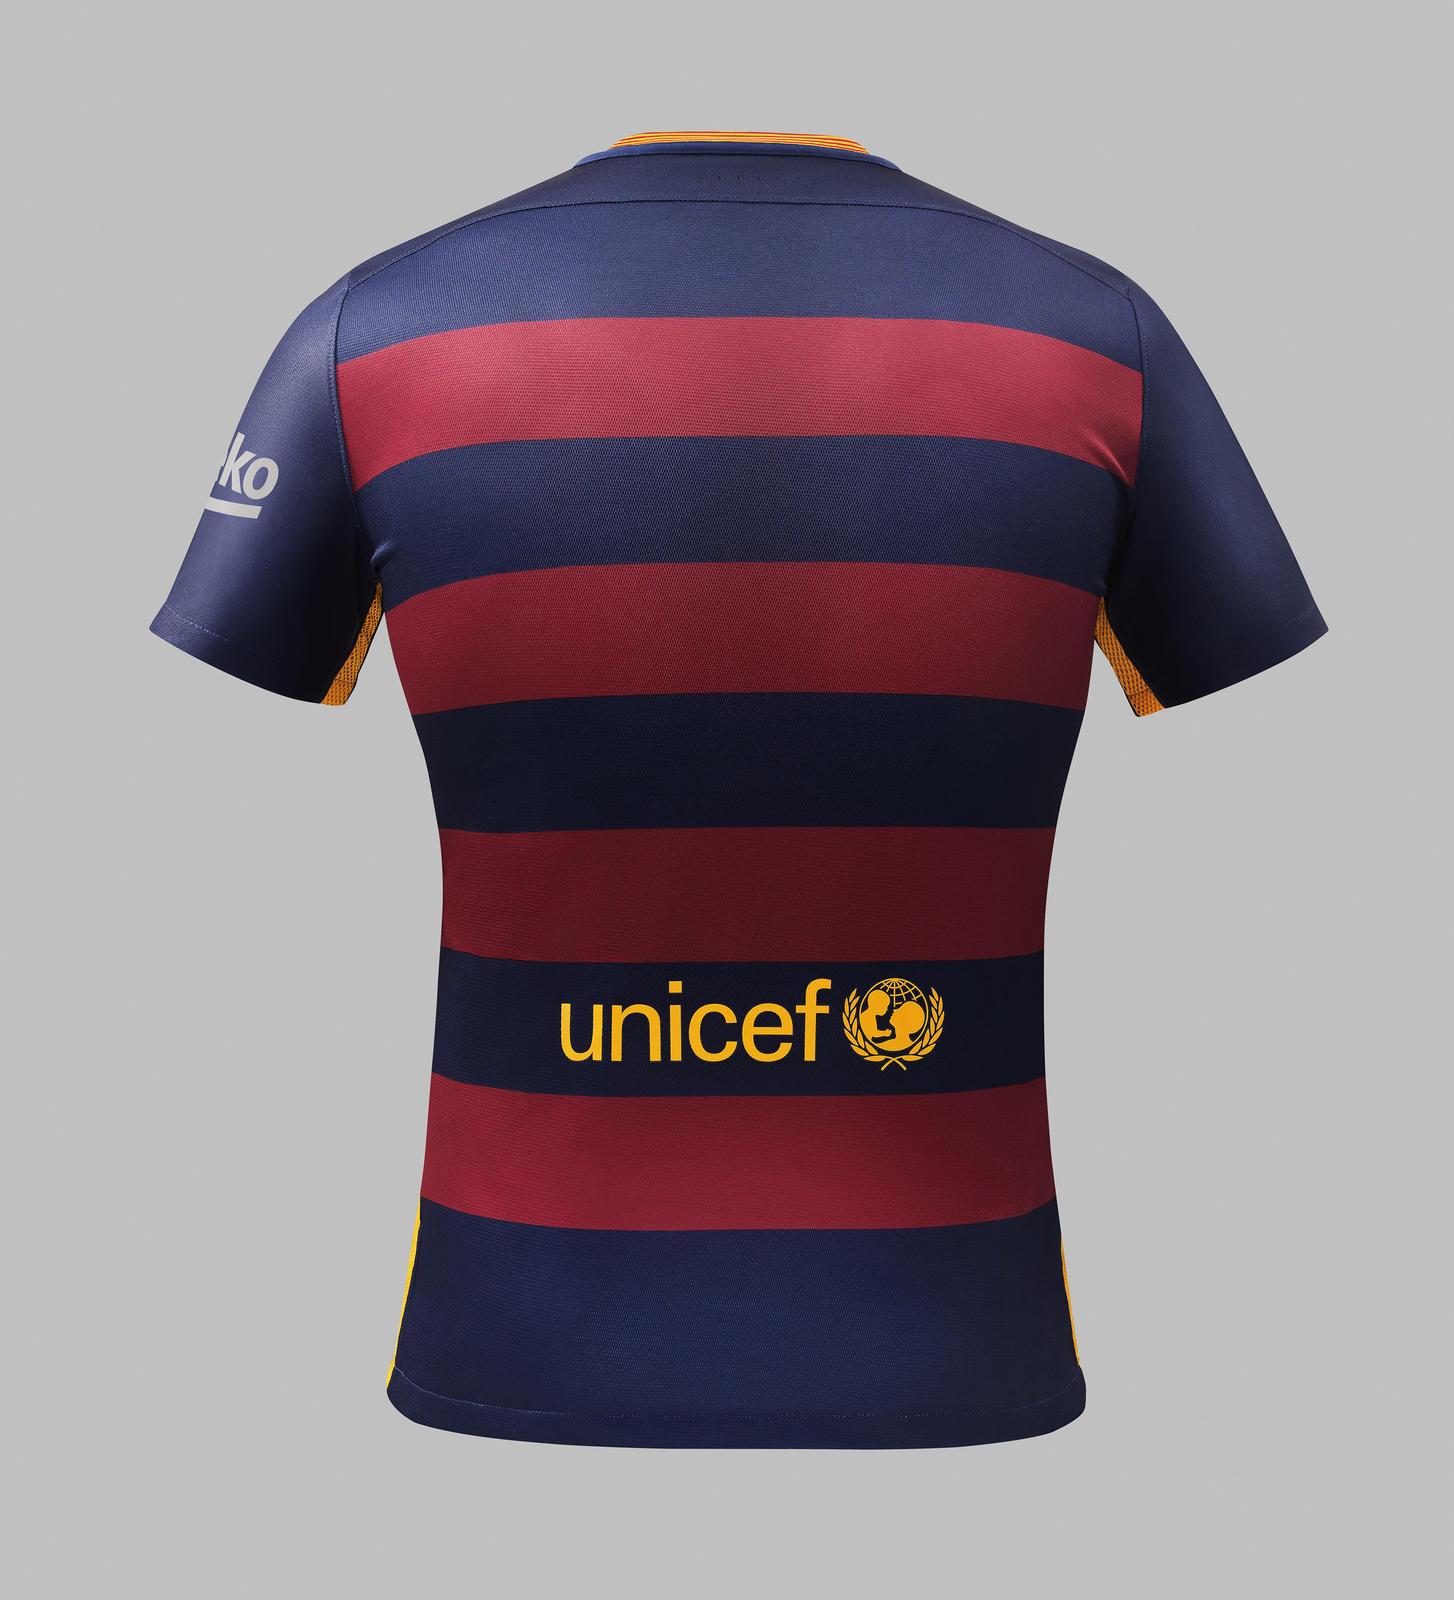 fc barcelona home jersey 2015 2016 nike football back